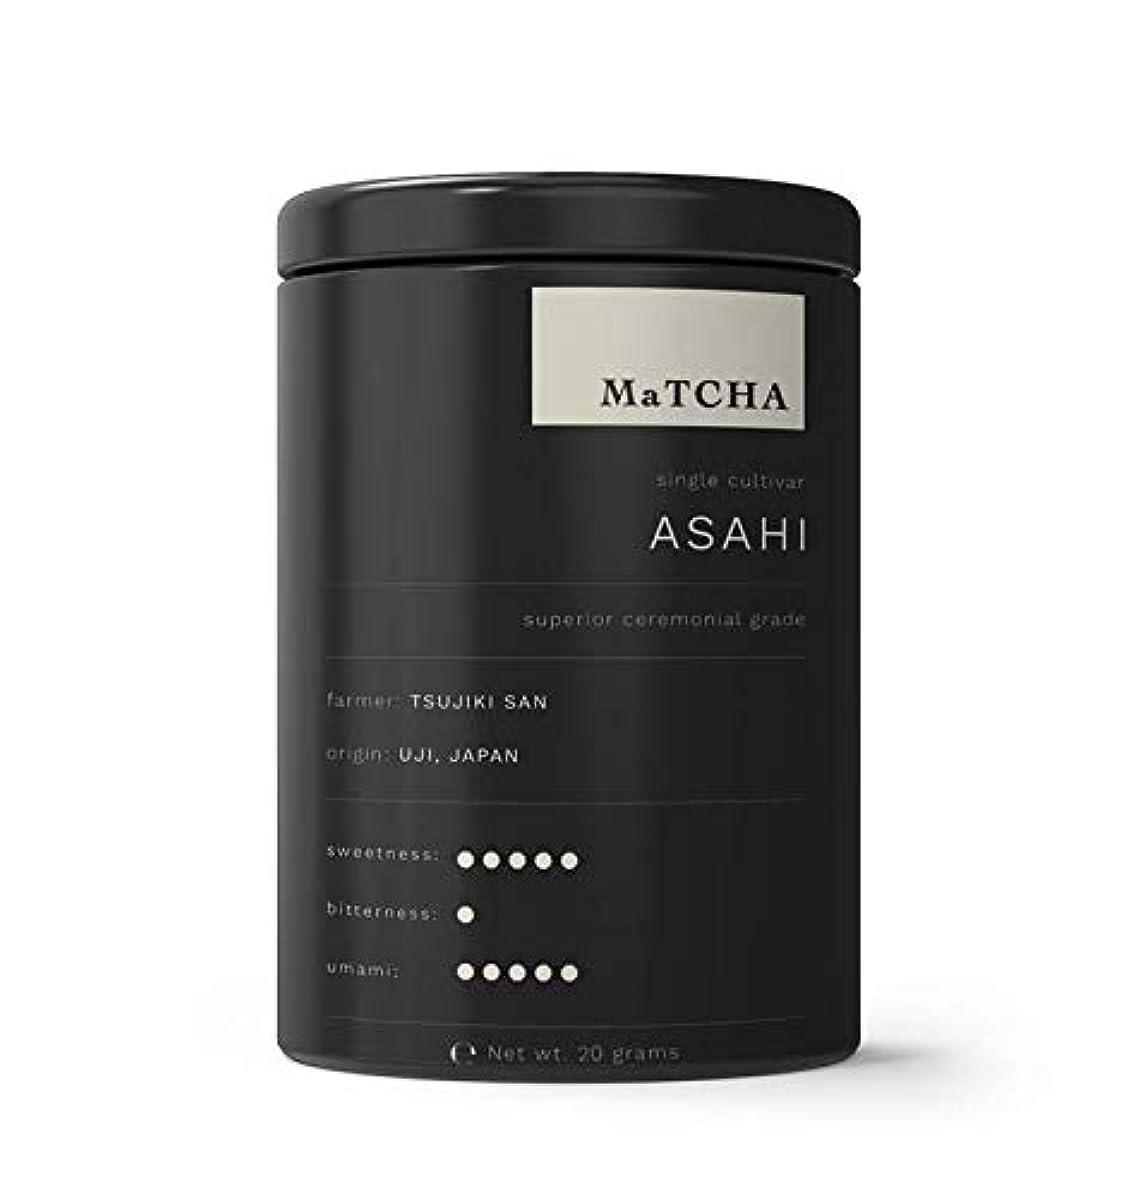 Asahi Matcha. Superior Ceremonial Grade Matcha Green Tea Directly from Japan